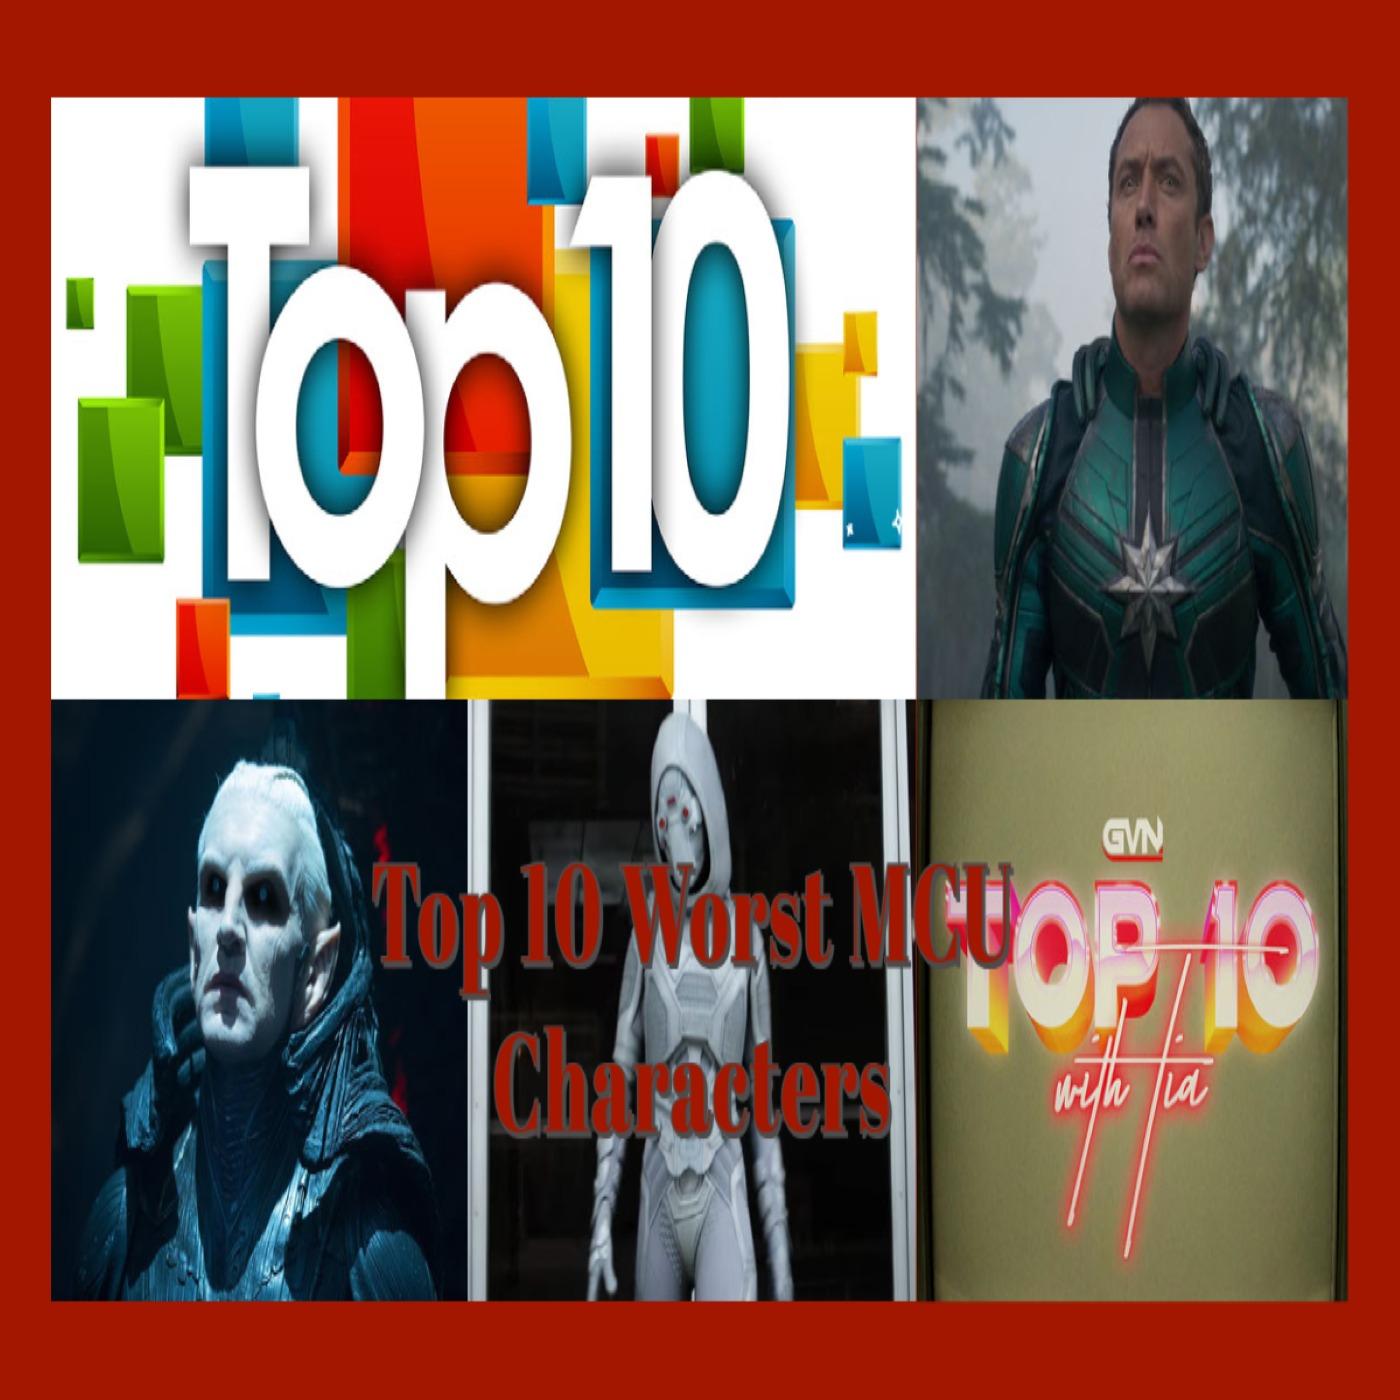 Top 10 Worst MCU Characters